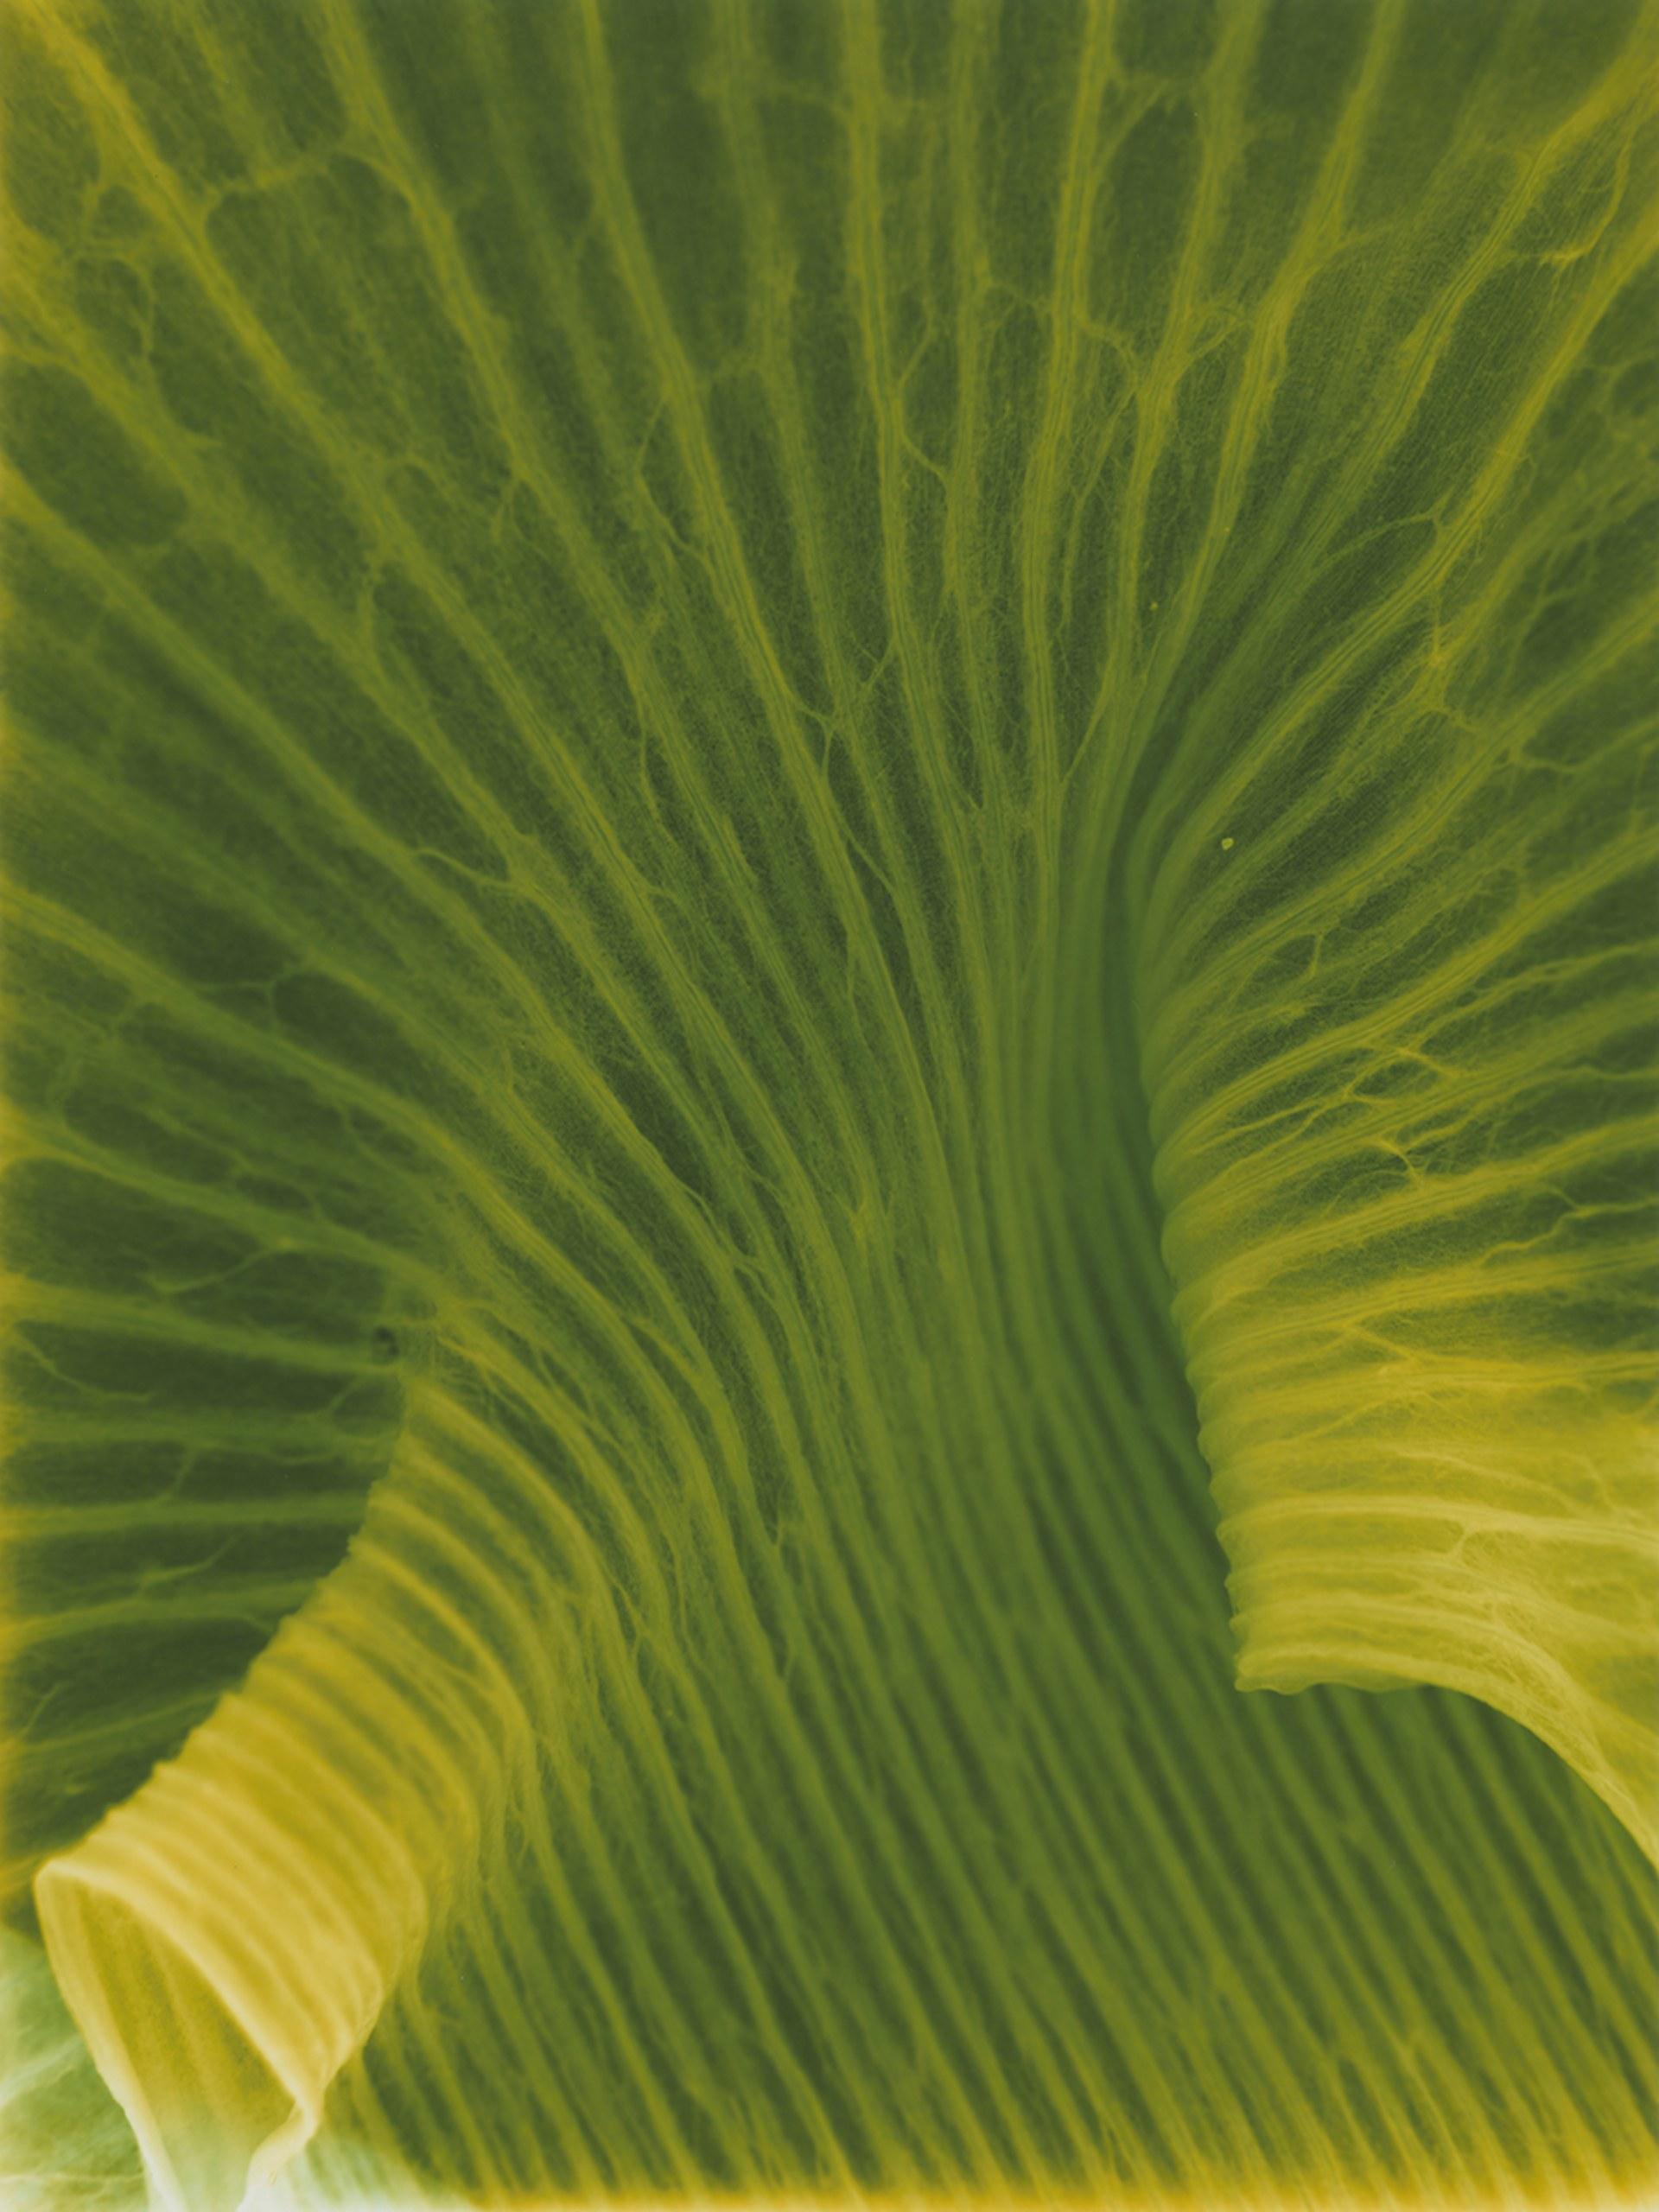 PhotoSynthesis VII